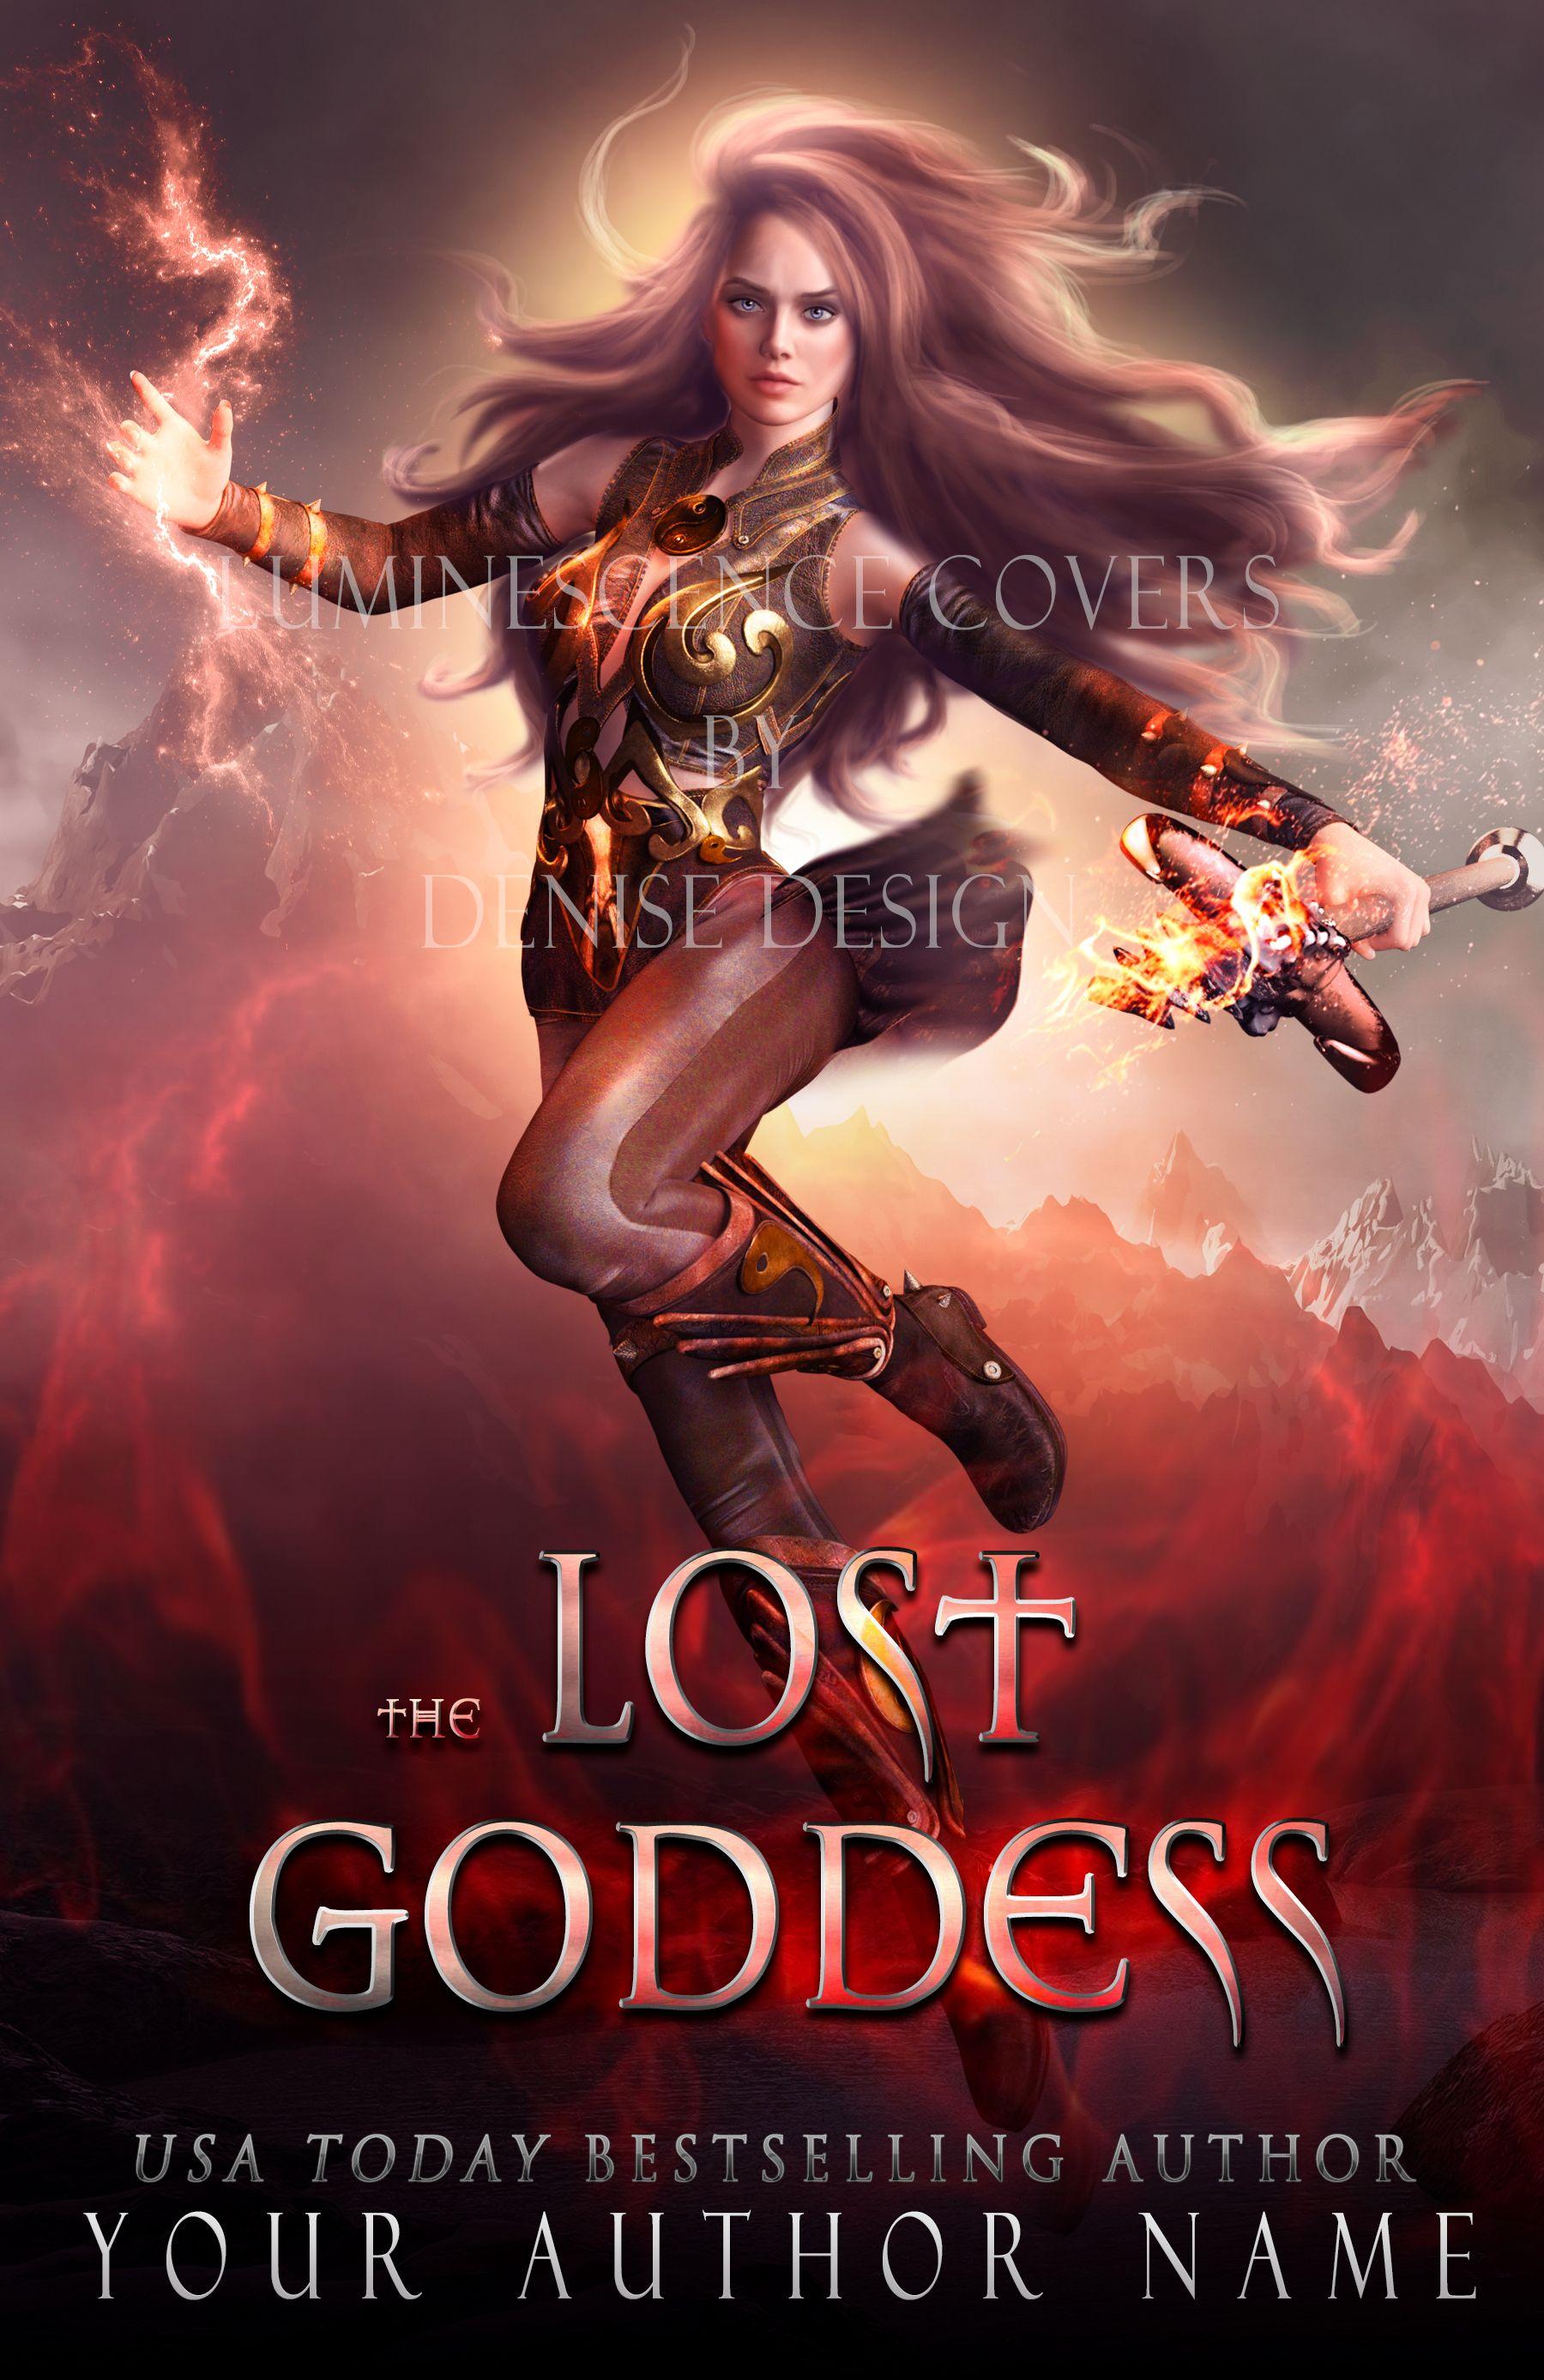 Premade And Custom Book Cover Design By Luminescence Covers Books Covers Design Amazon E Fantasy Book Covers Premade Book Covers Paranormal Romance Books